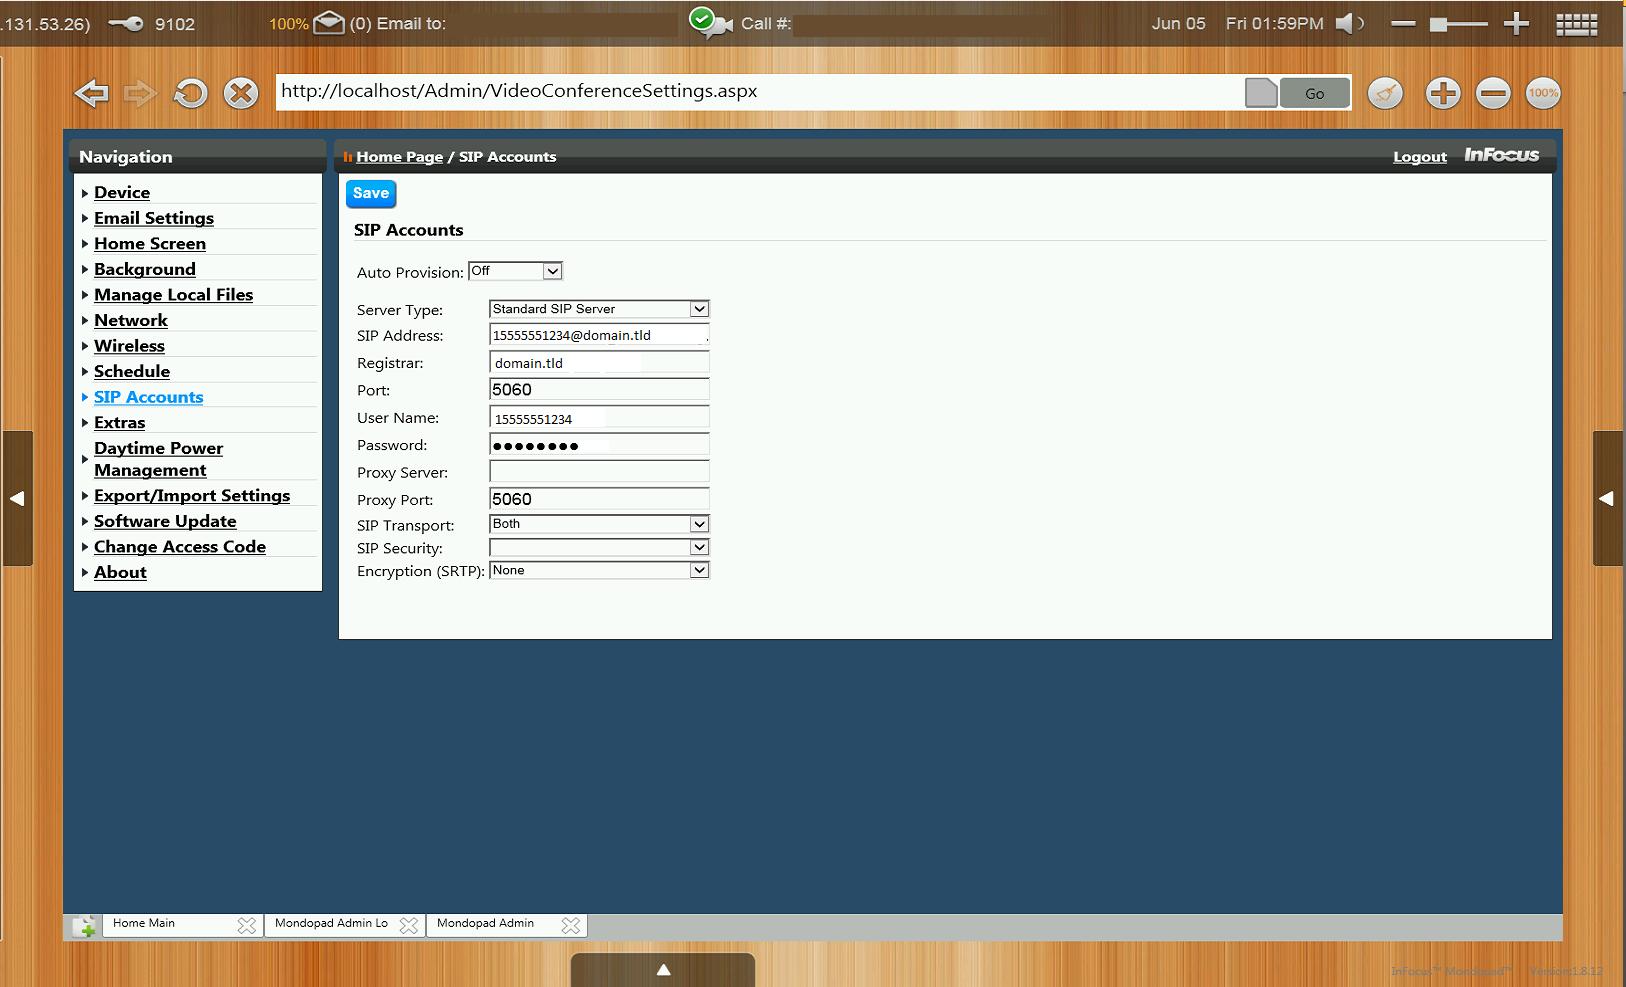 Infocus Mondopad Registered with CUCM – SIP – Packet Pilot